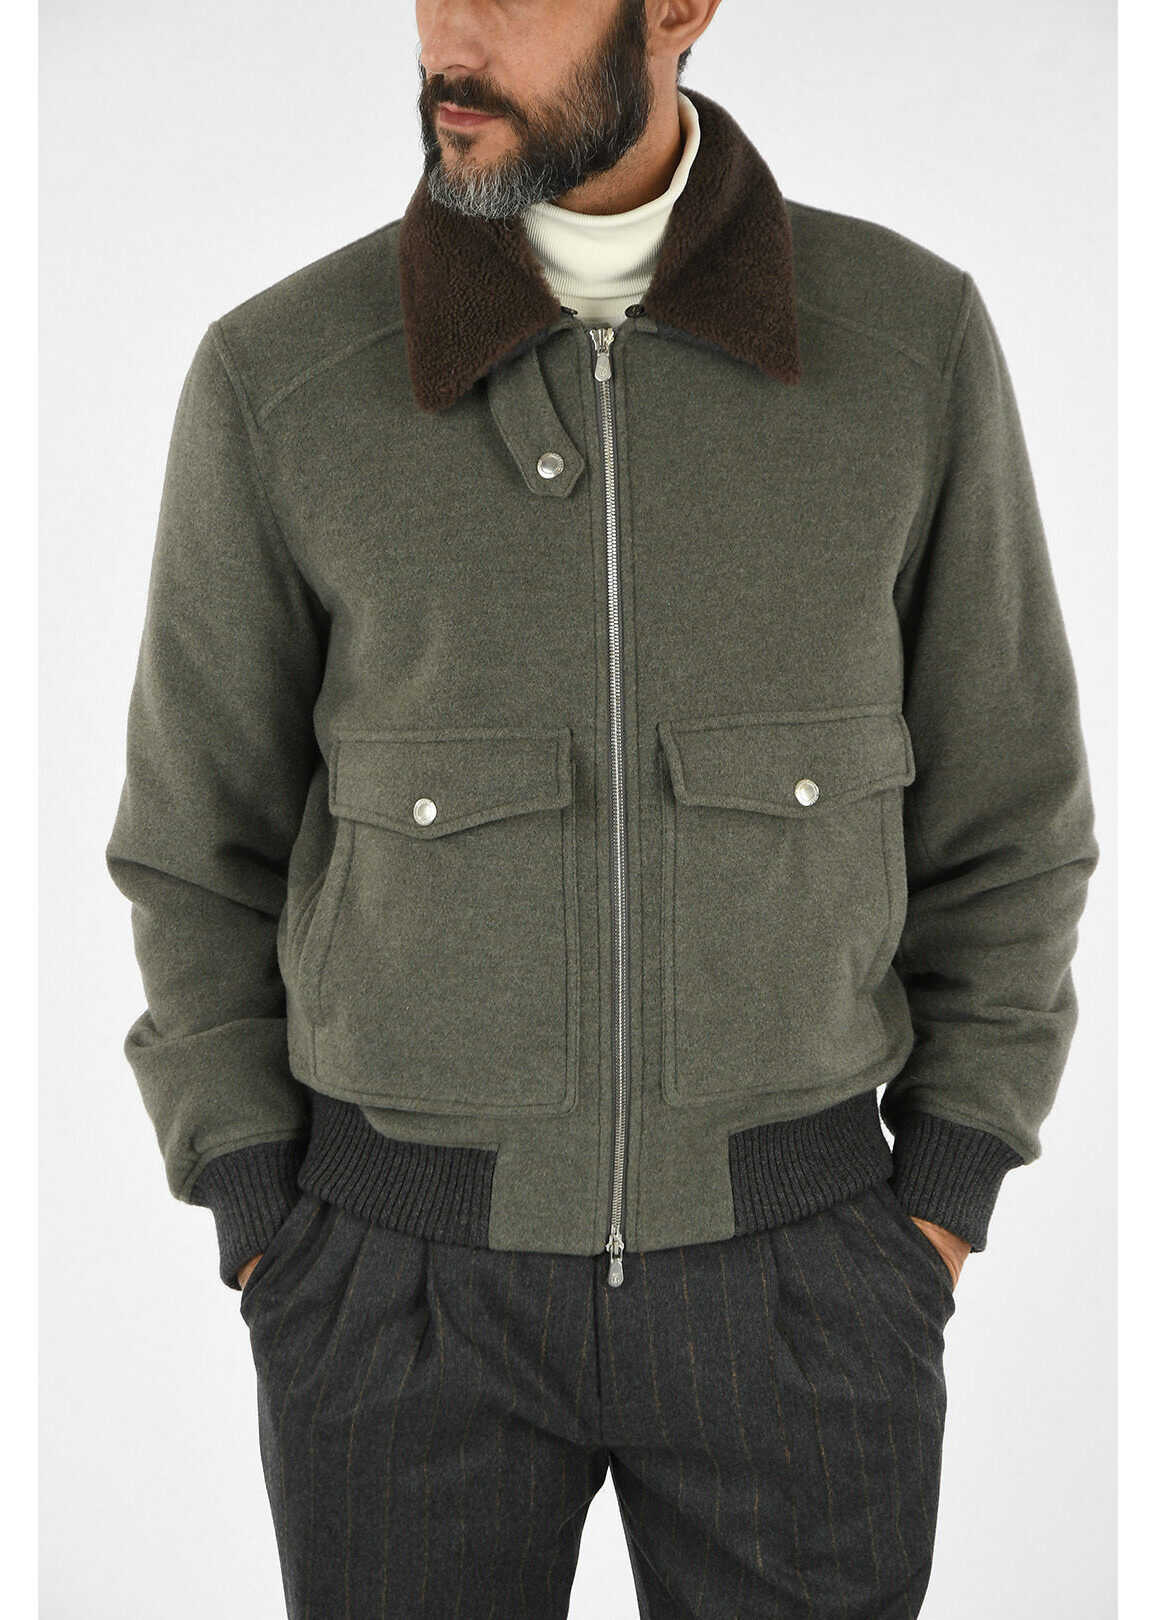 Wool and Cashmere Biker Jacket